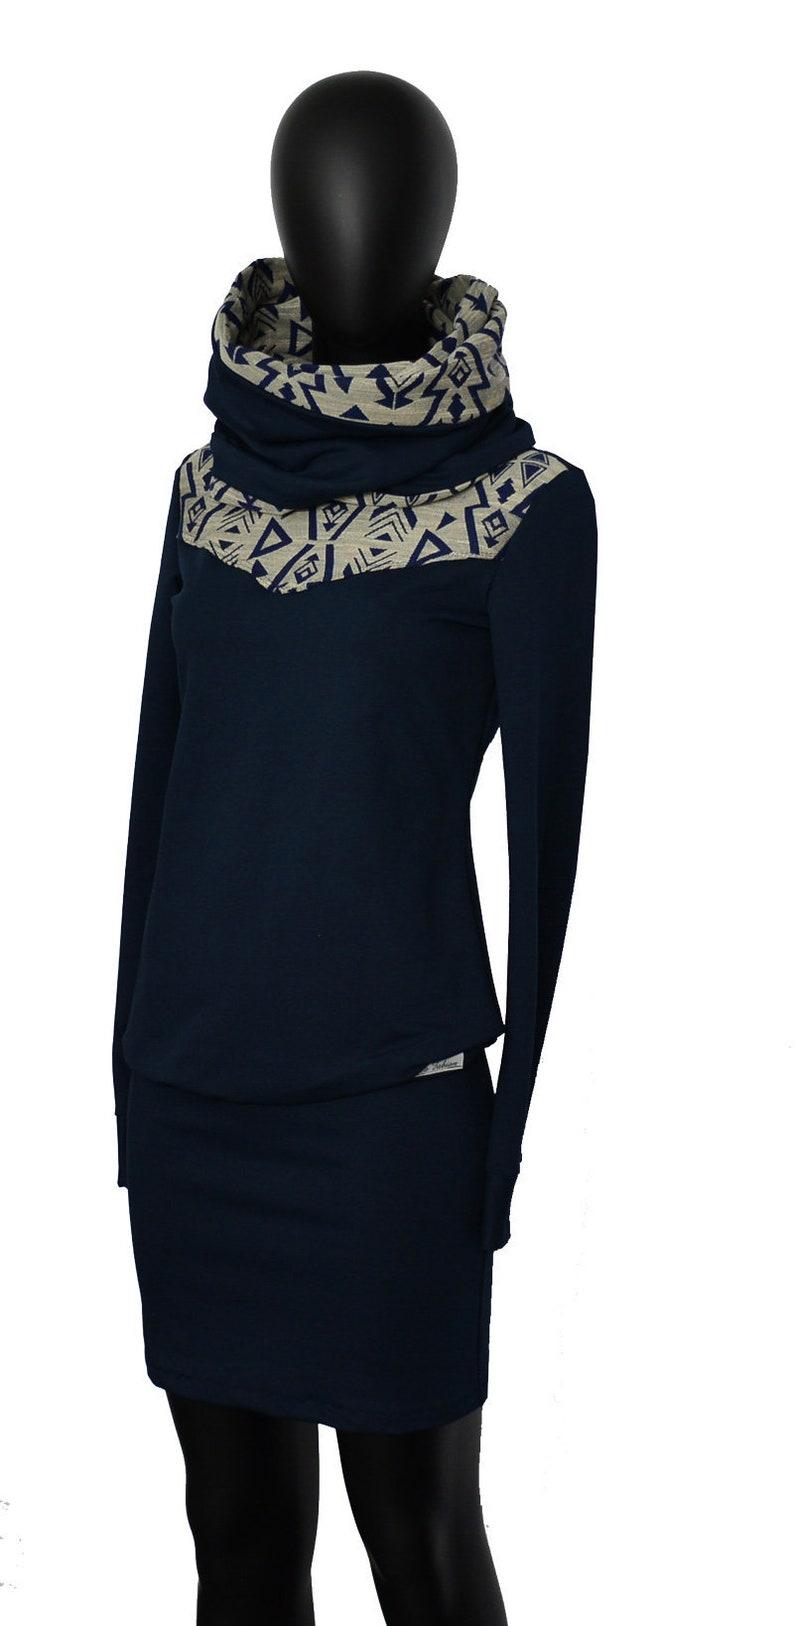 Preis vergleichen glatt Premium-Auswahl Dress Hoodie Set Loop Dress Aja Blue Pattern damen women blue